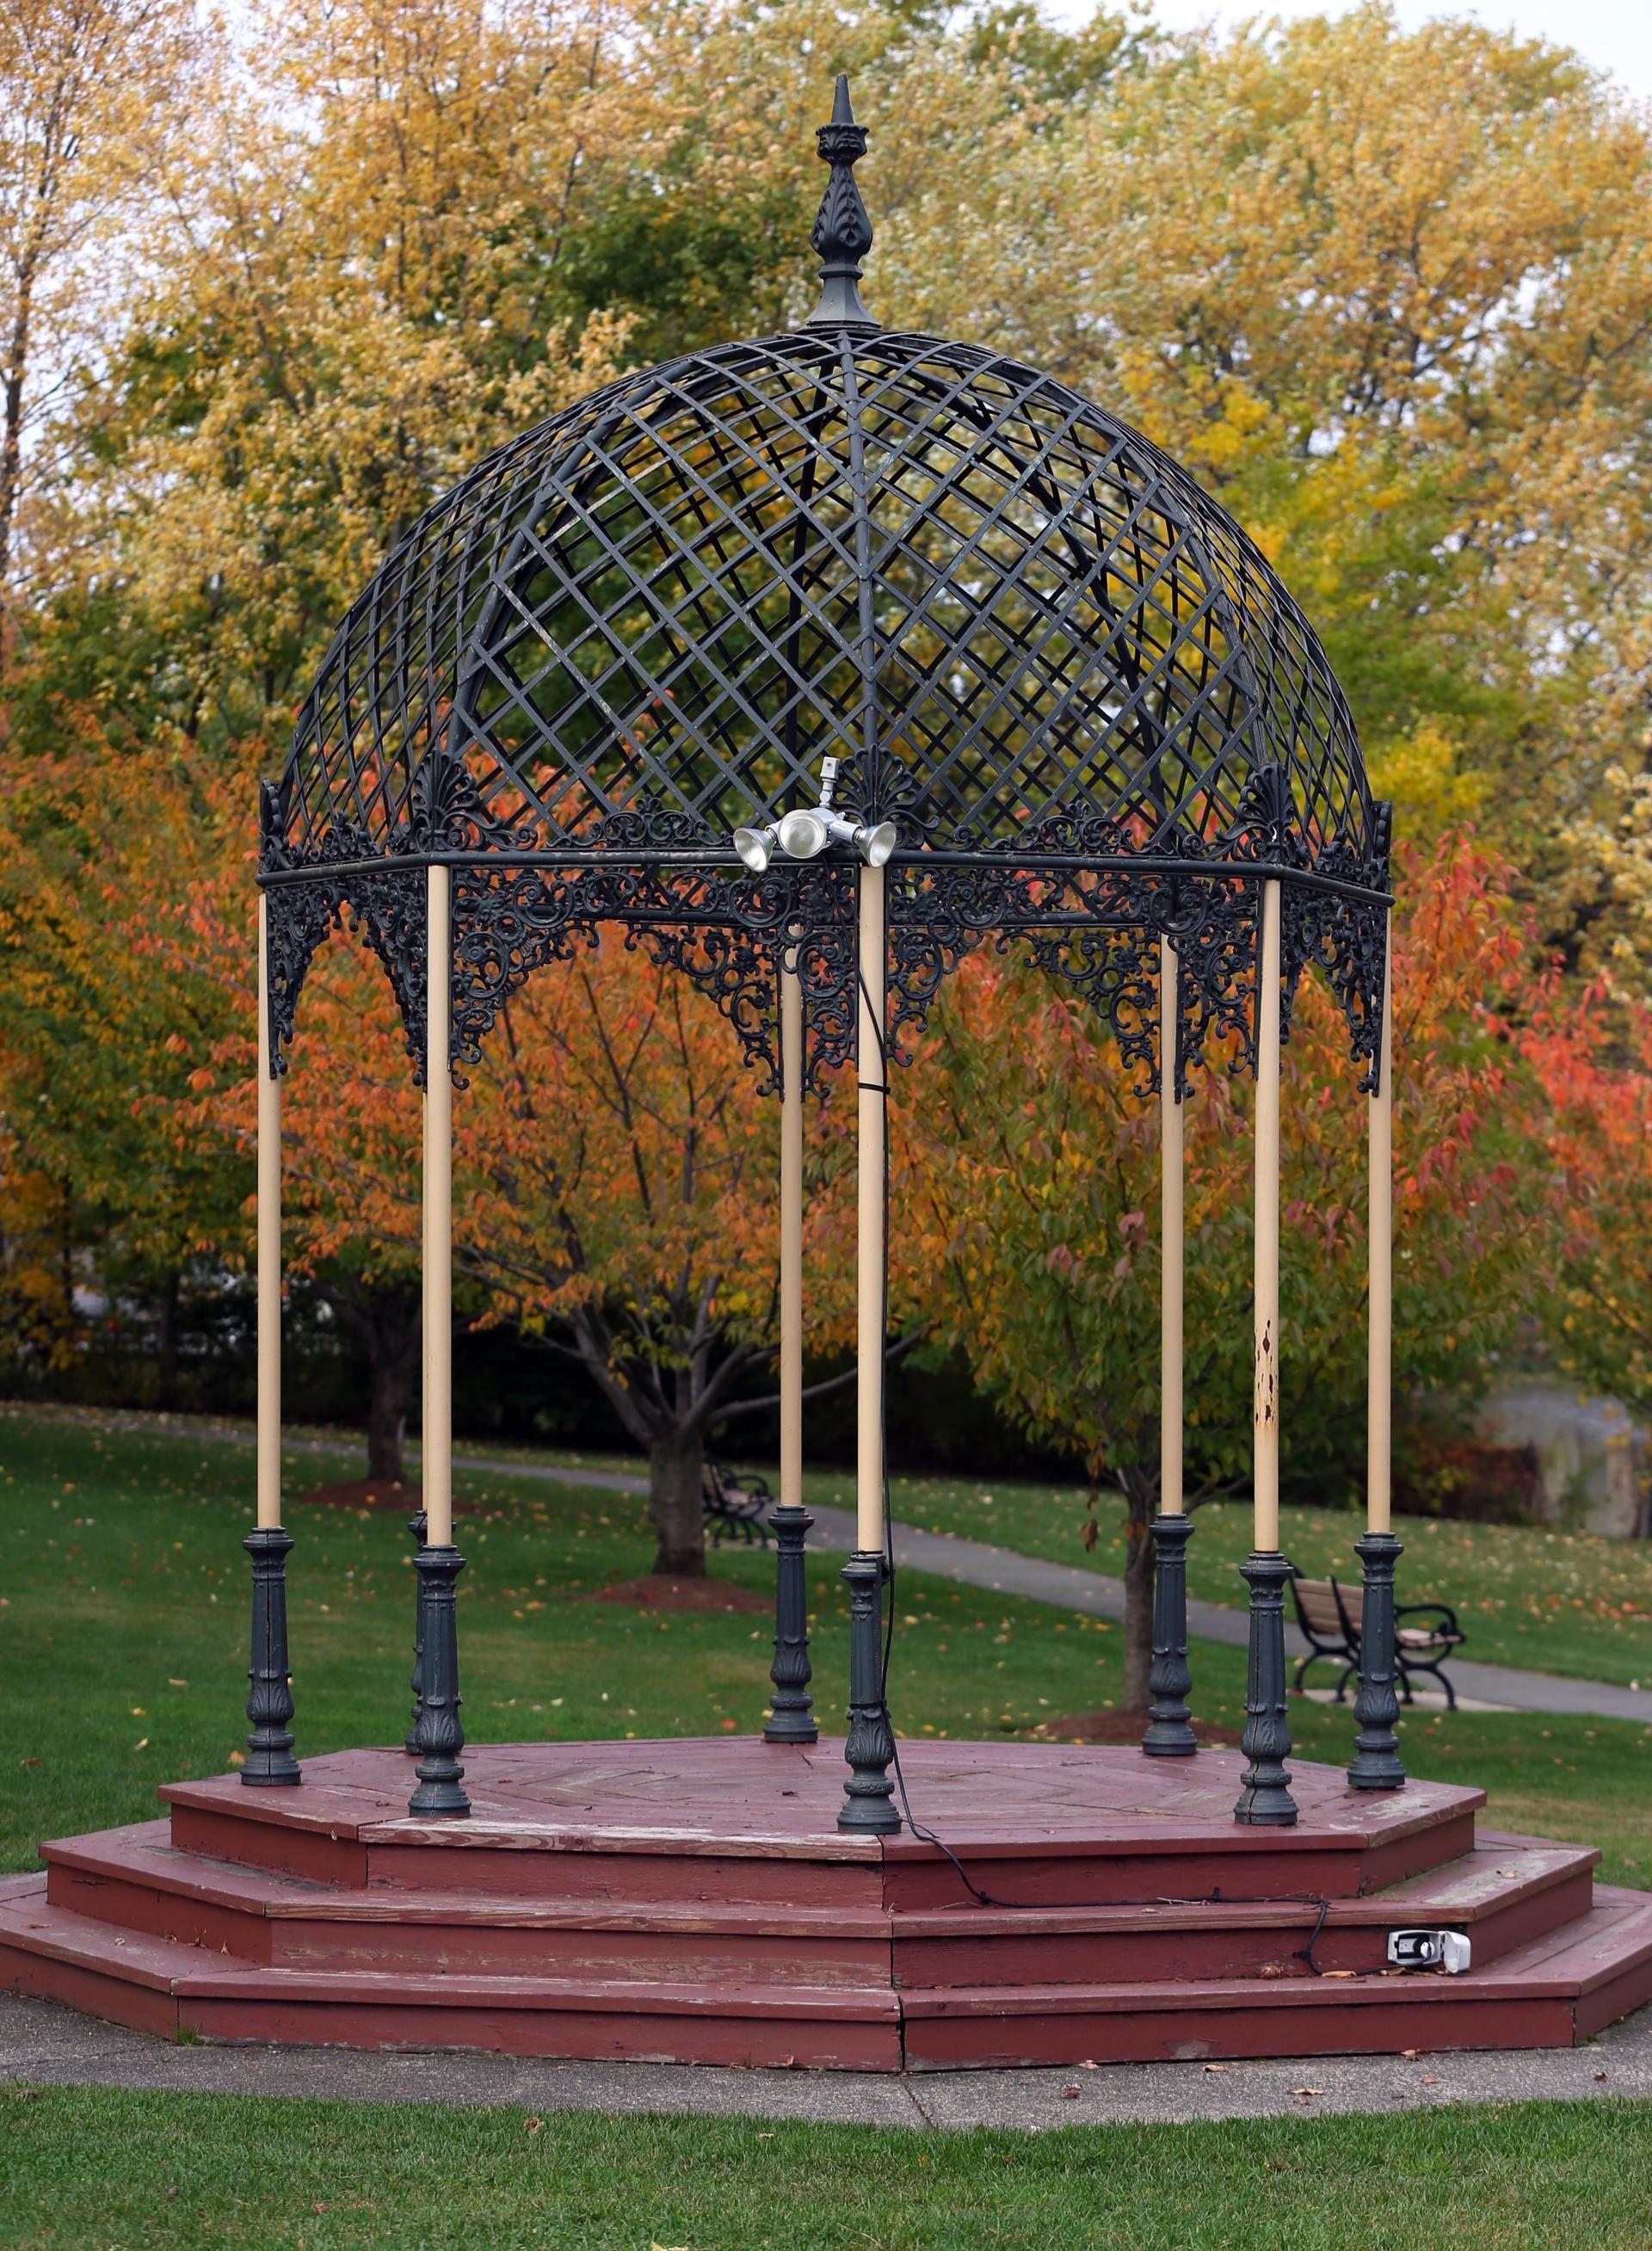 Https://www.bostonglobe.com/lifestyle/real Estate/2014/11/08/what Like Live  Melrose/PlCloyFOZfaom1kWyj1nNL/story.html